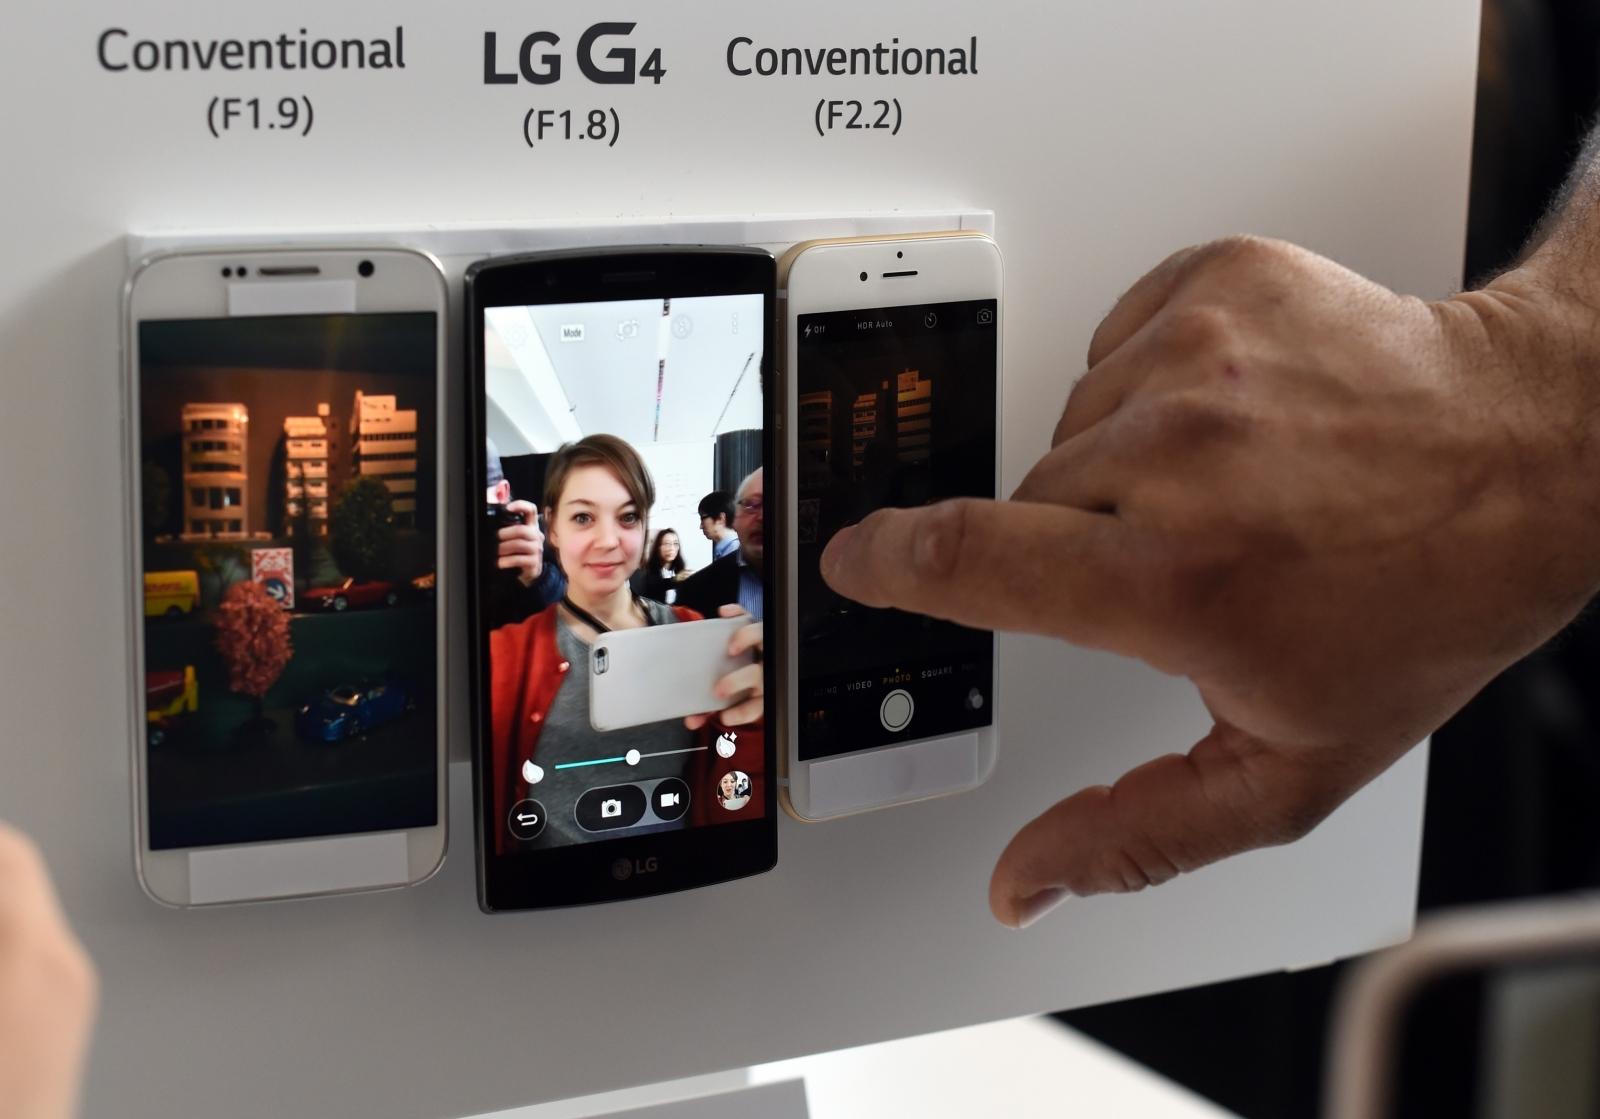 LG G4 bootloop issue